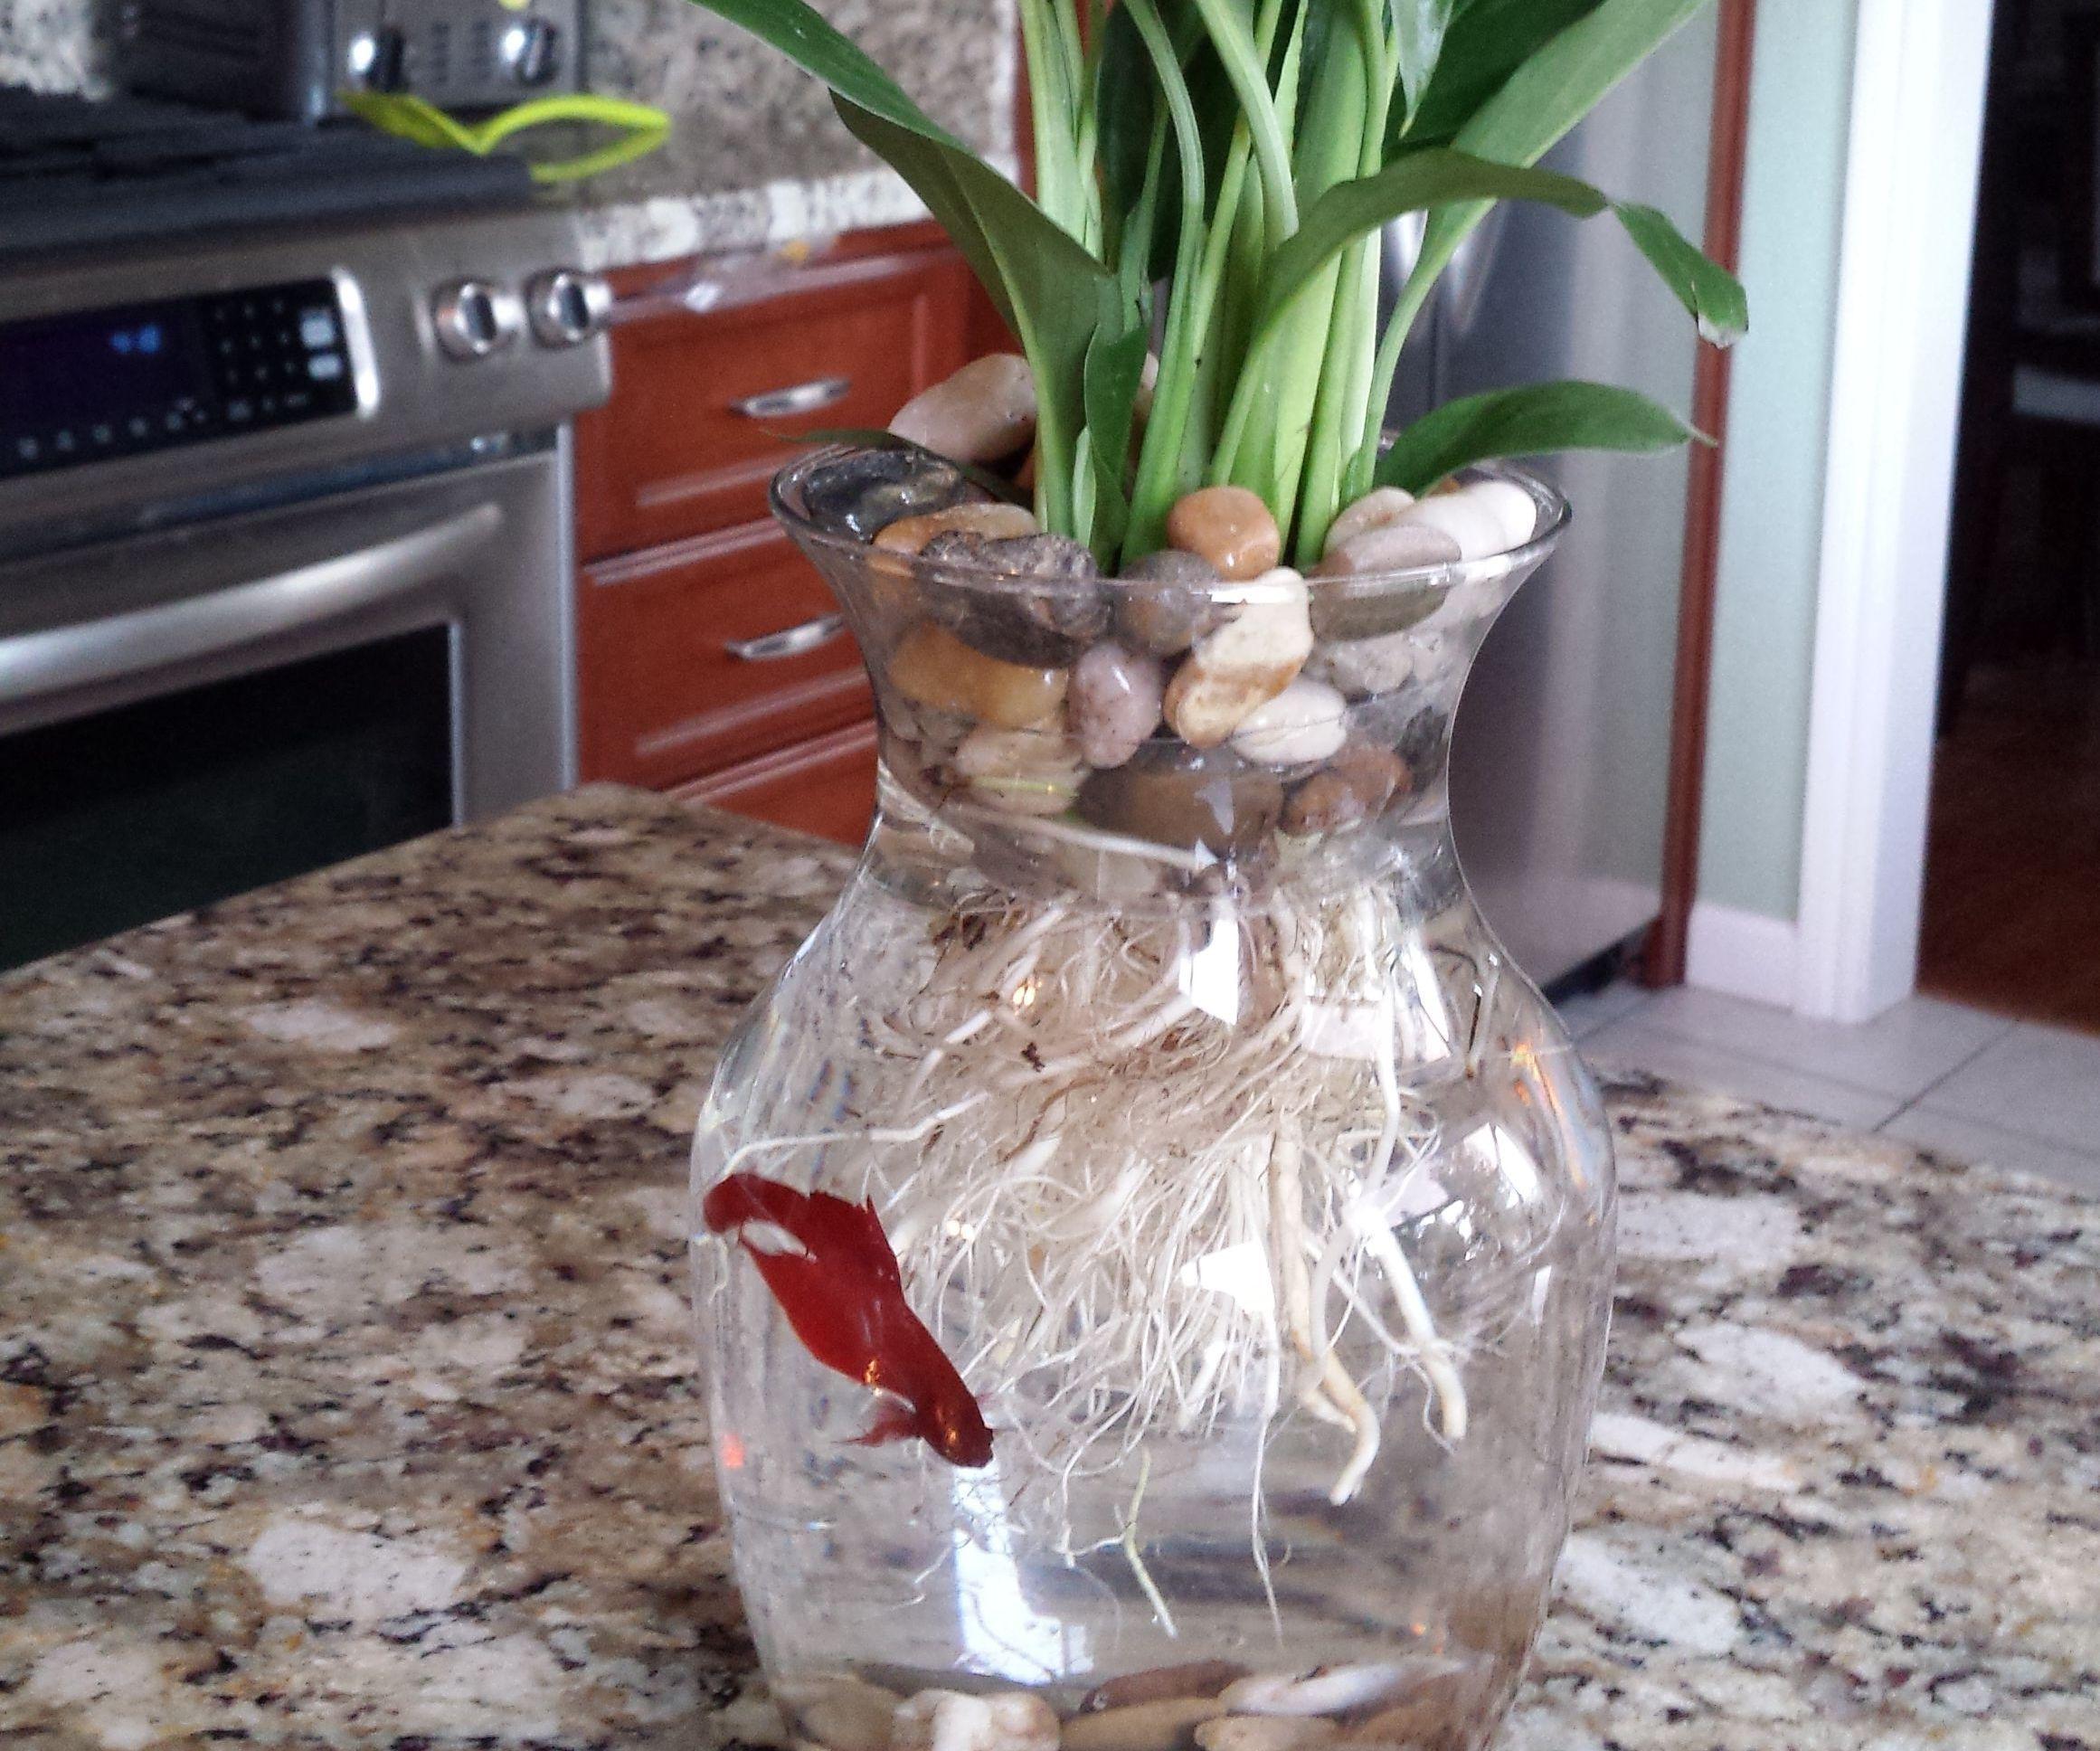 Instructables & $8 Betta Fish \u0026 Flower Vase: 4 Steps